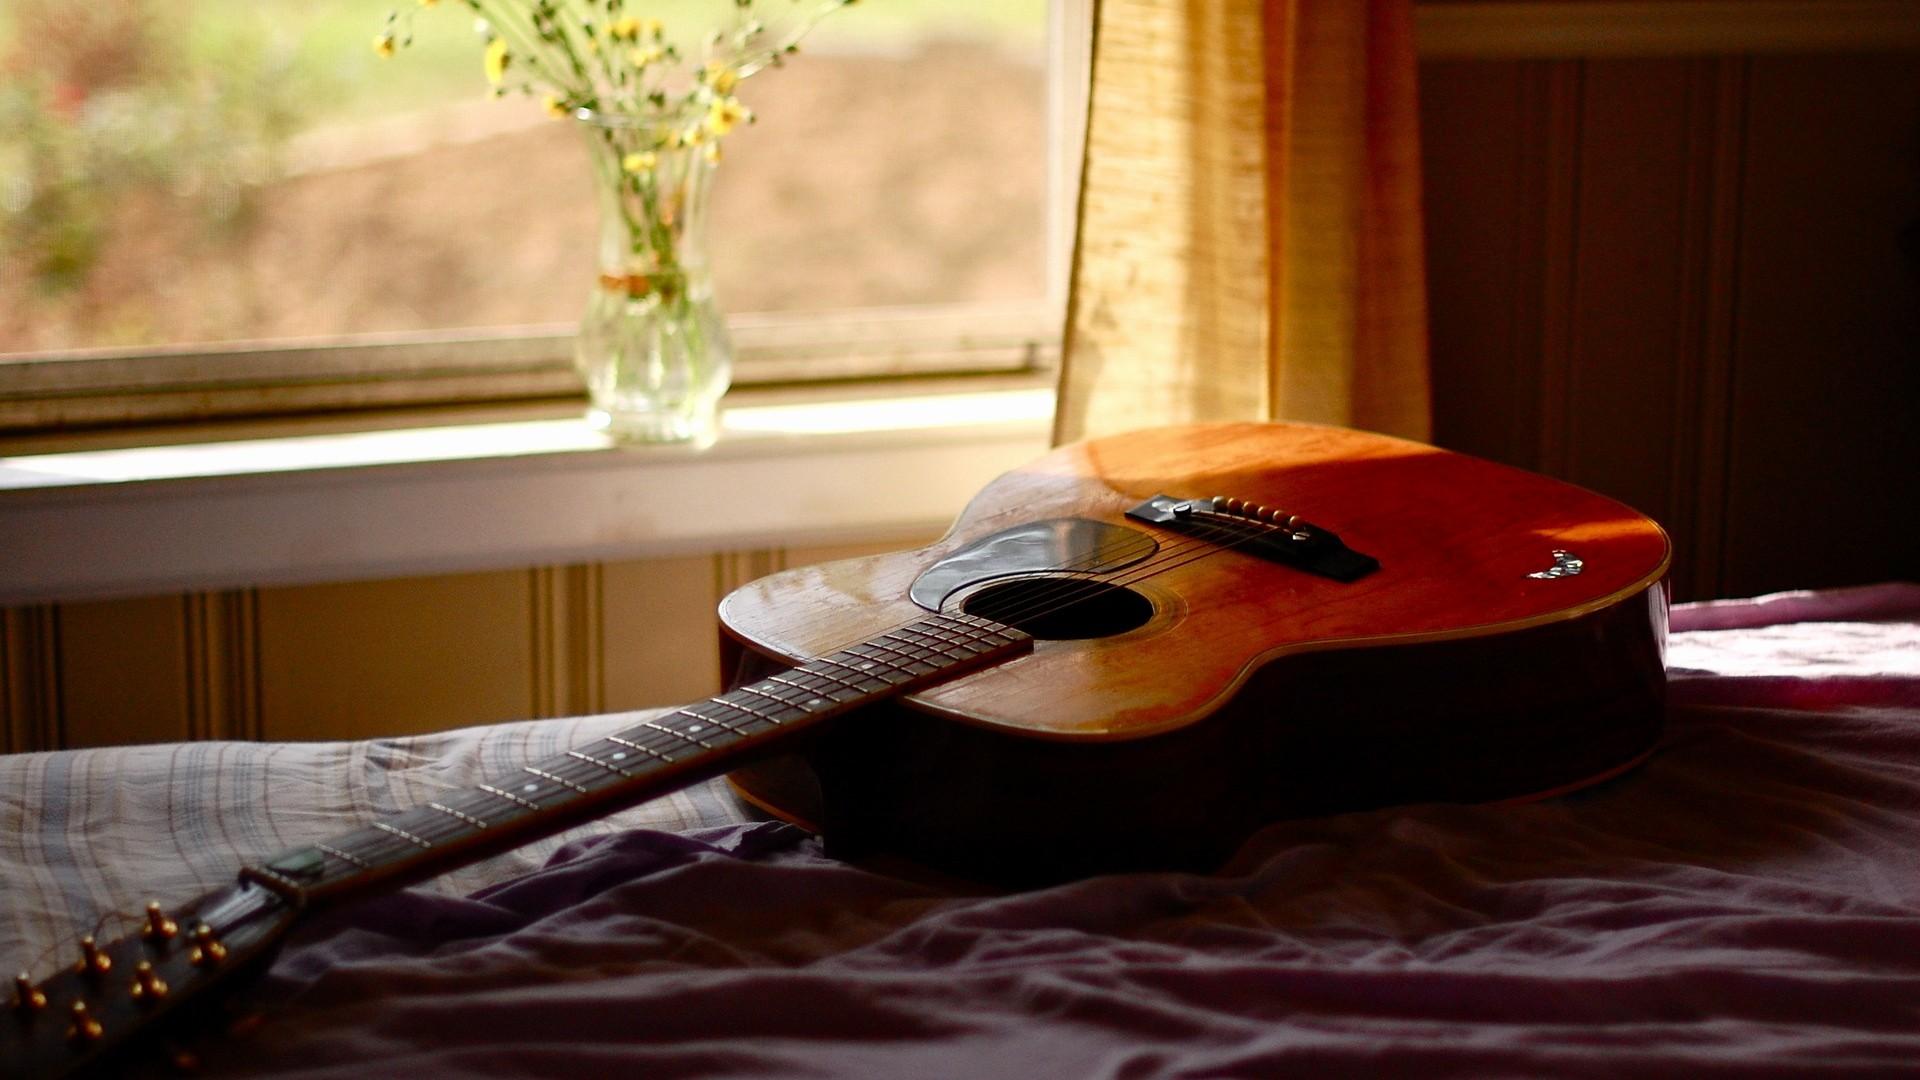 1920x1080 Gibson J 150 Acoustic Guitar Hd Pictures Wallpaper Free Download Elegant Martin Wallpapersafari